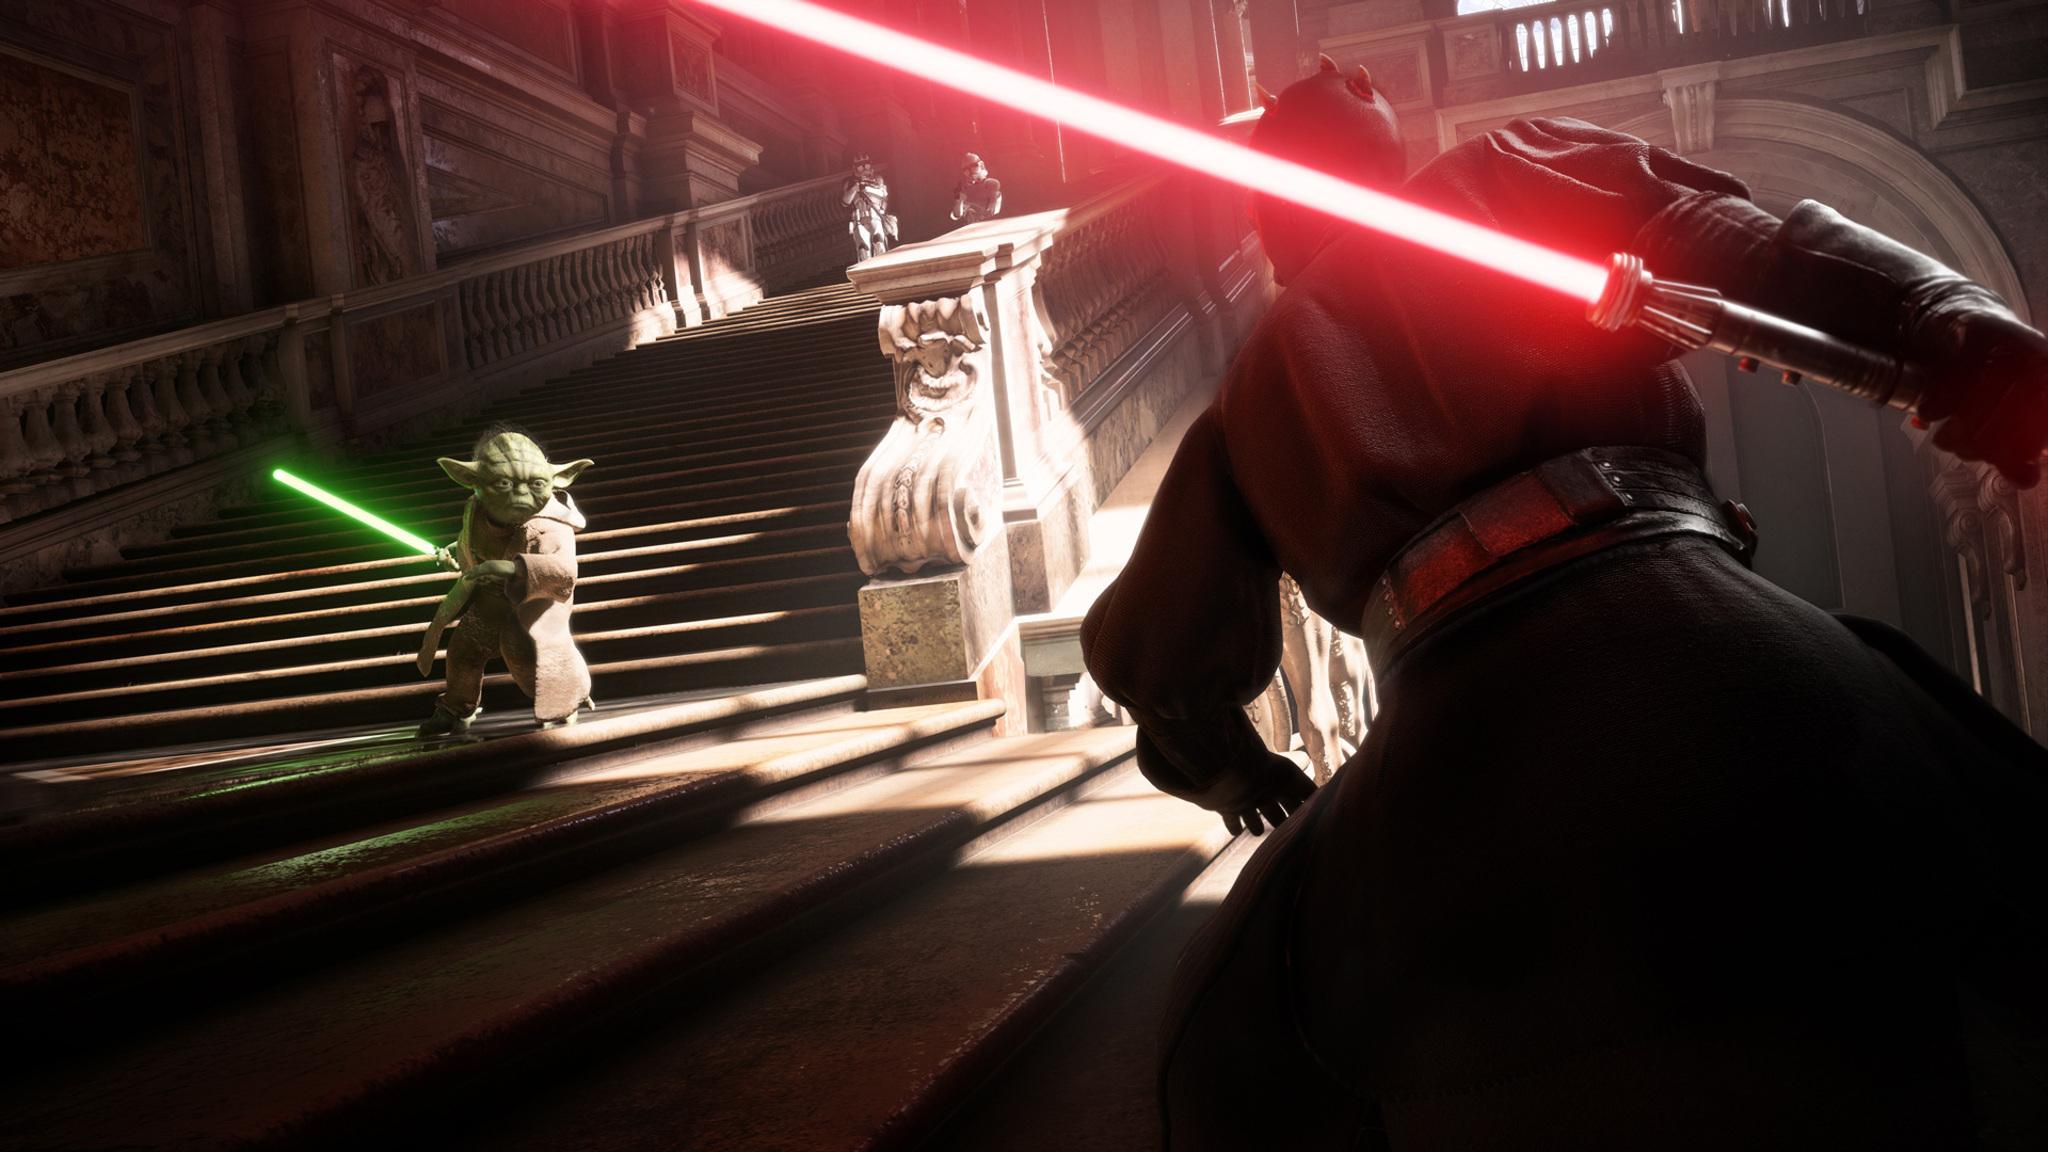 2048x1152 Yoda Vs Darth Vader Star Wars Battlefront 2 2048x1152